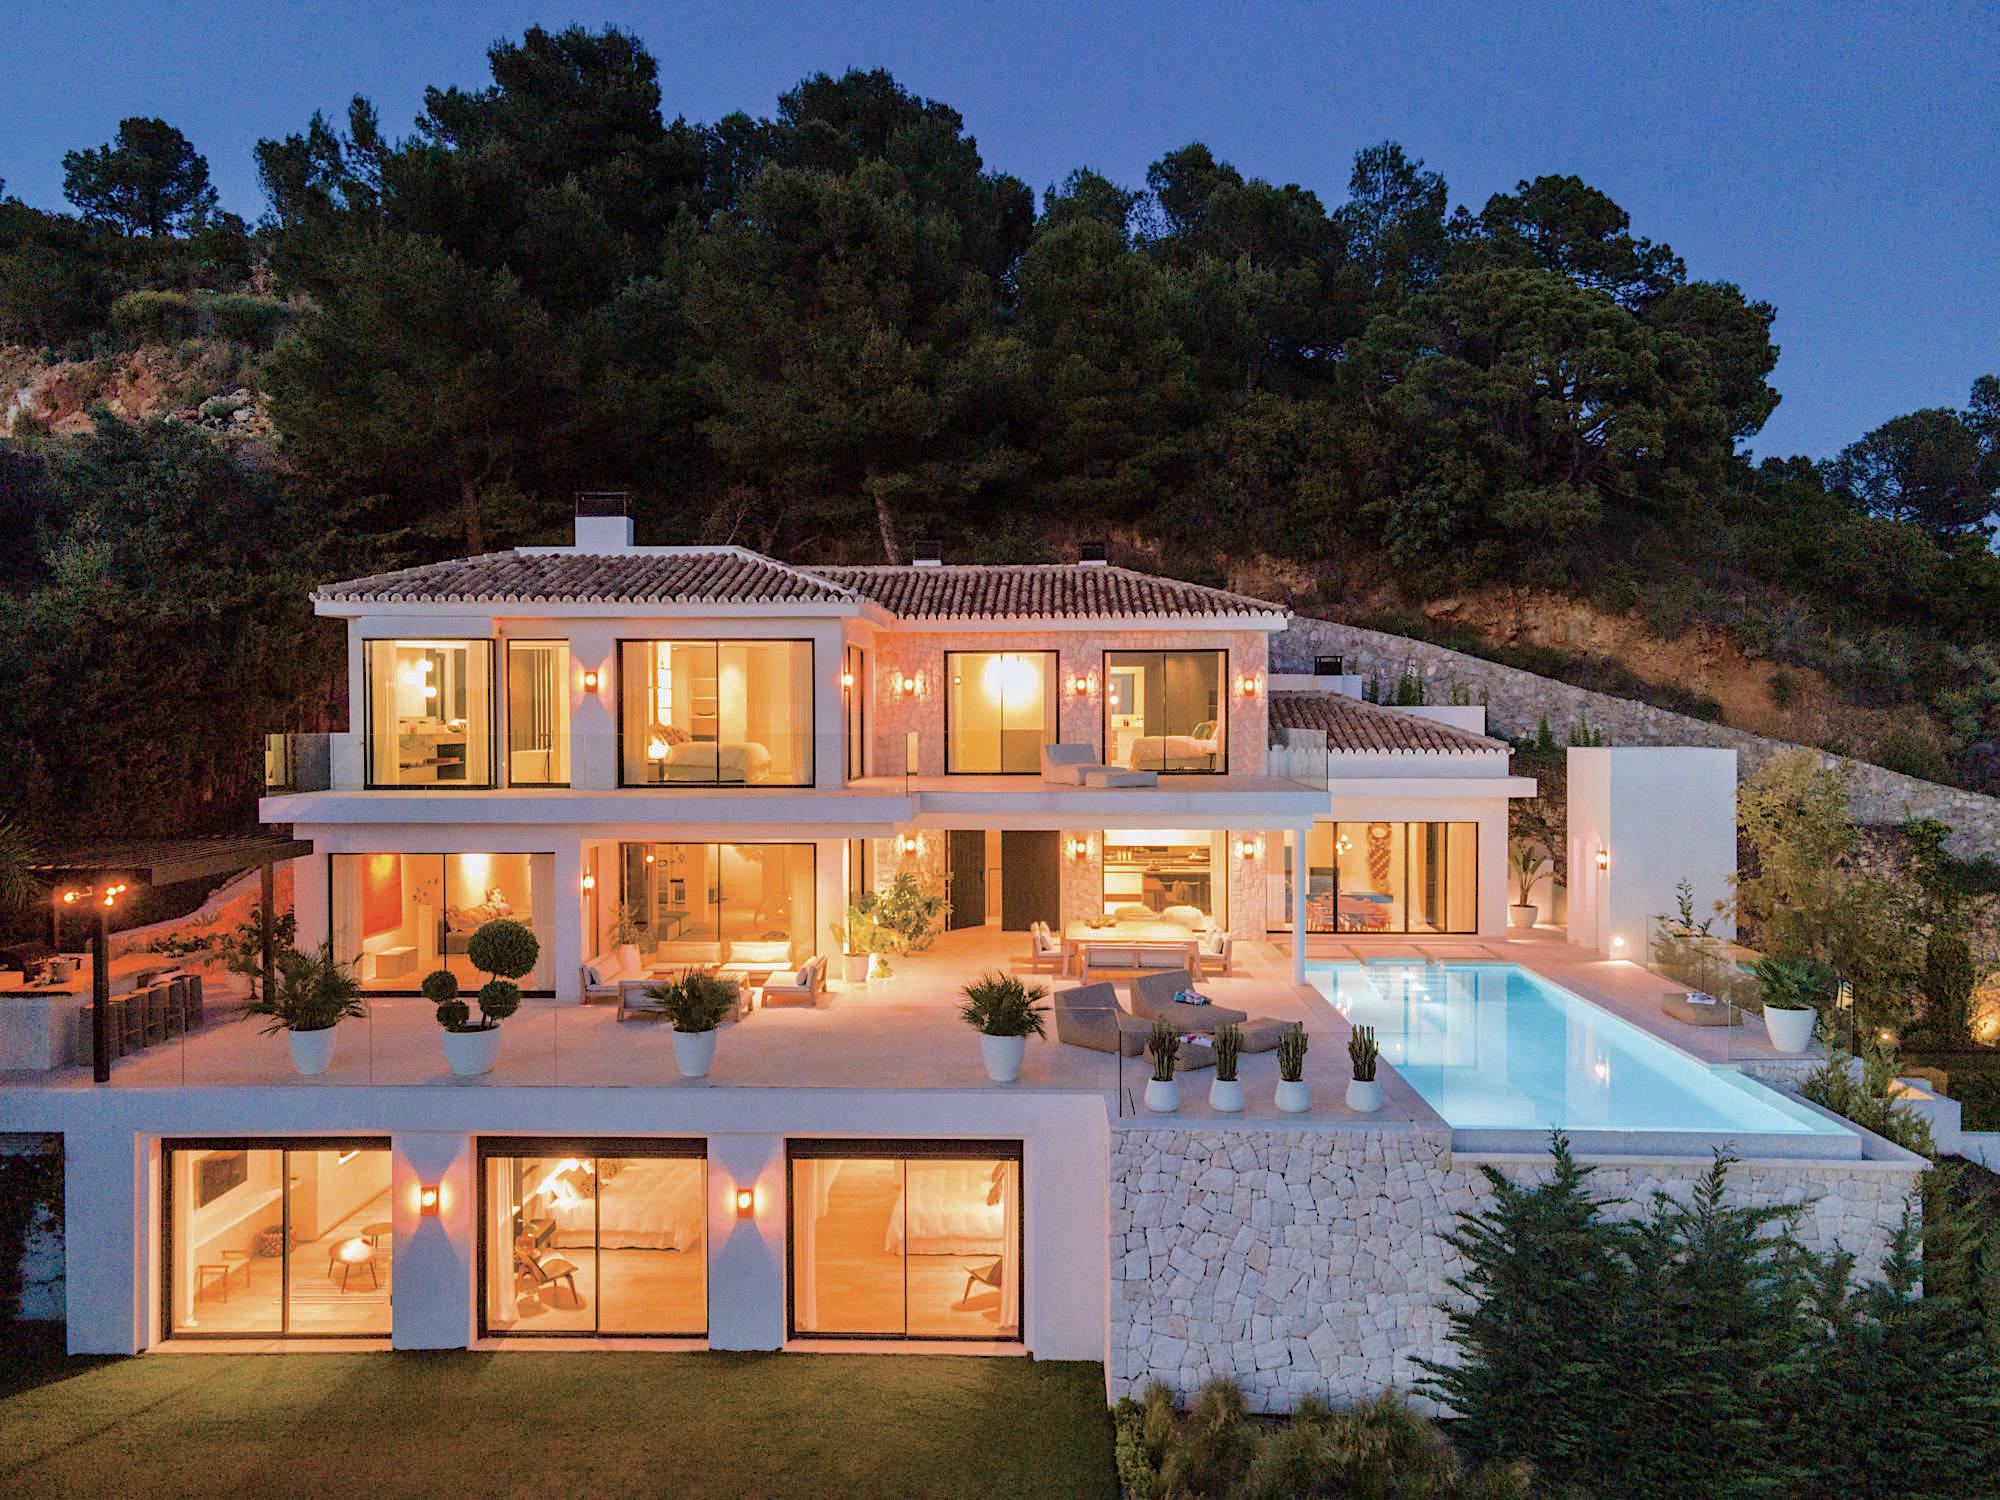 LUXURY VILLA FOR SALE   ANDALUSIA SPAIN   6 995 000 EURO